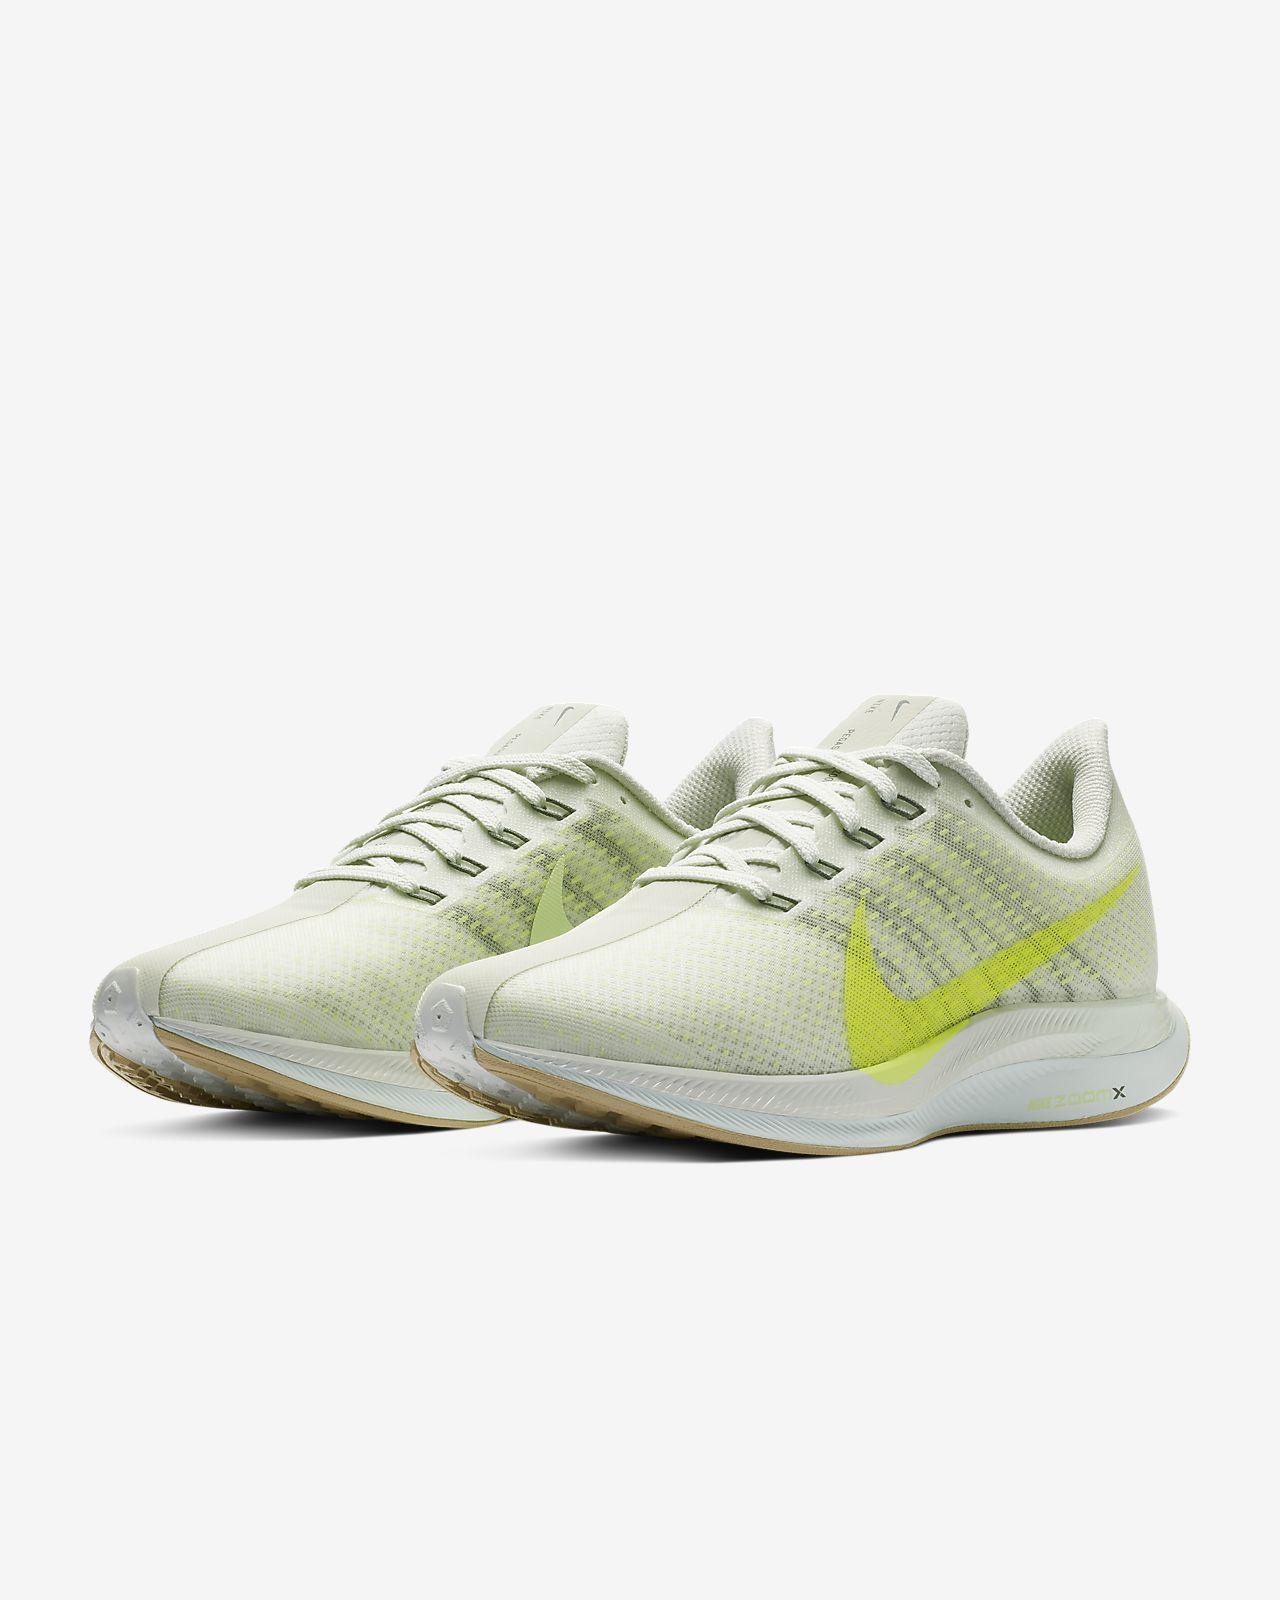 ccf84356f077 Nike Zoom Pegasus Turbo Women s Running Shoe. Nike.com